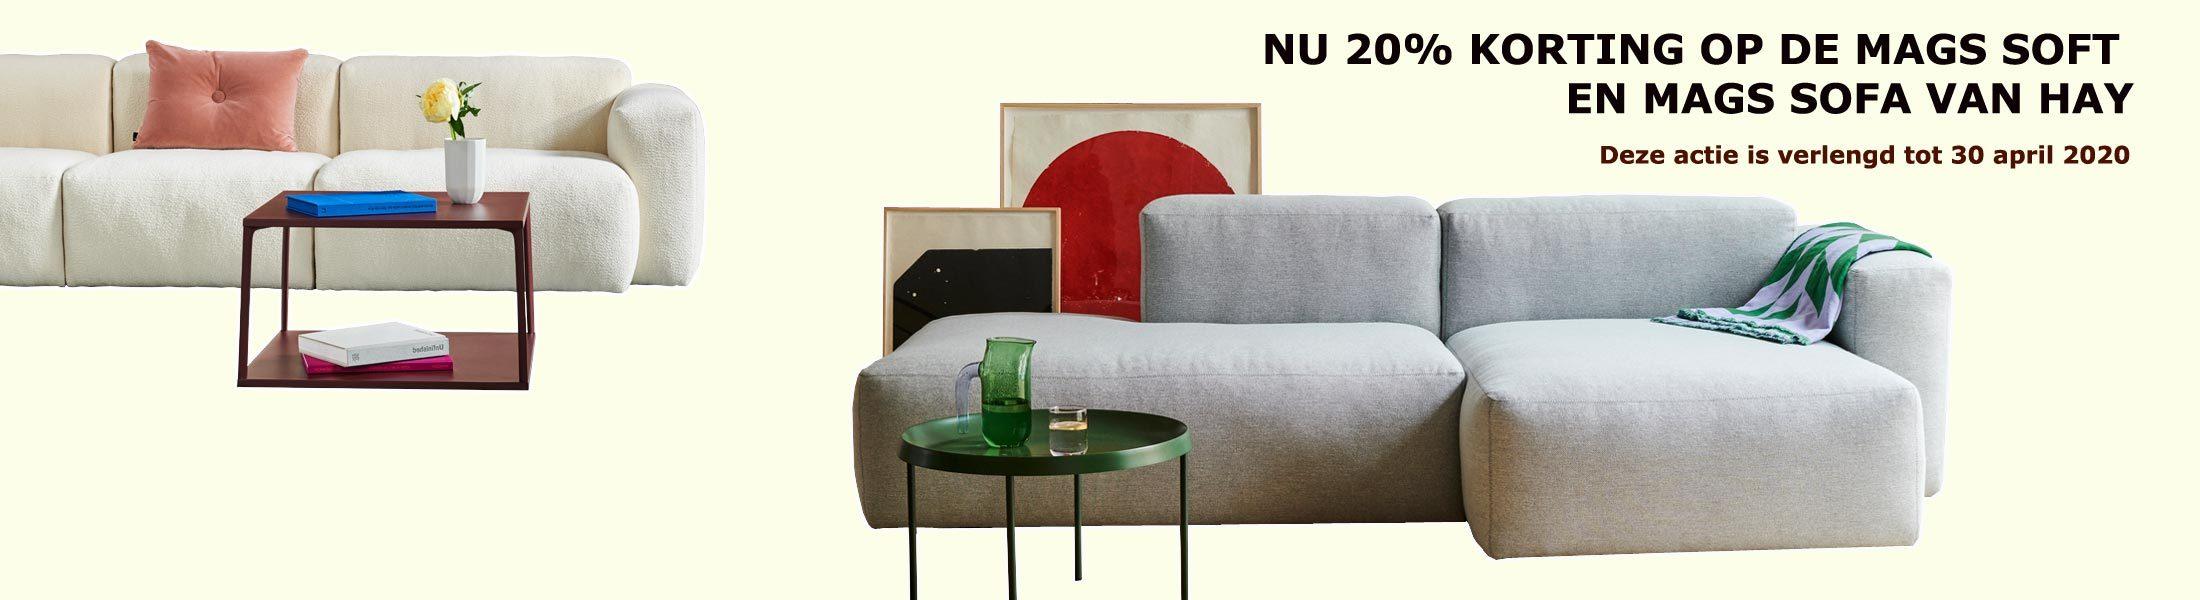 aanbieding mags soft sofa HAY -20%